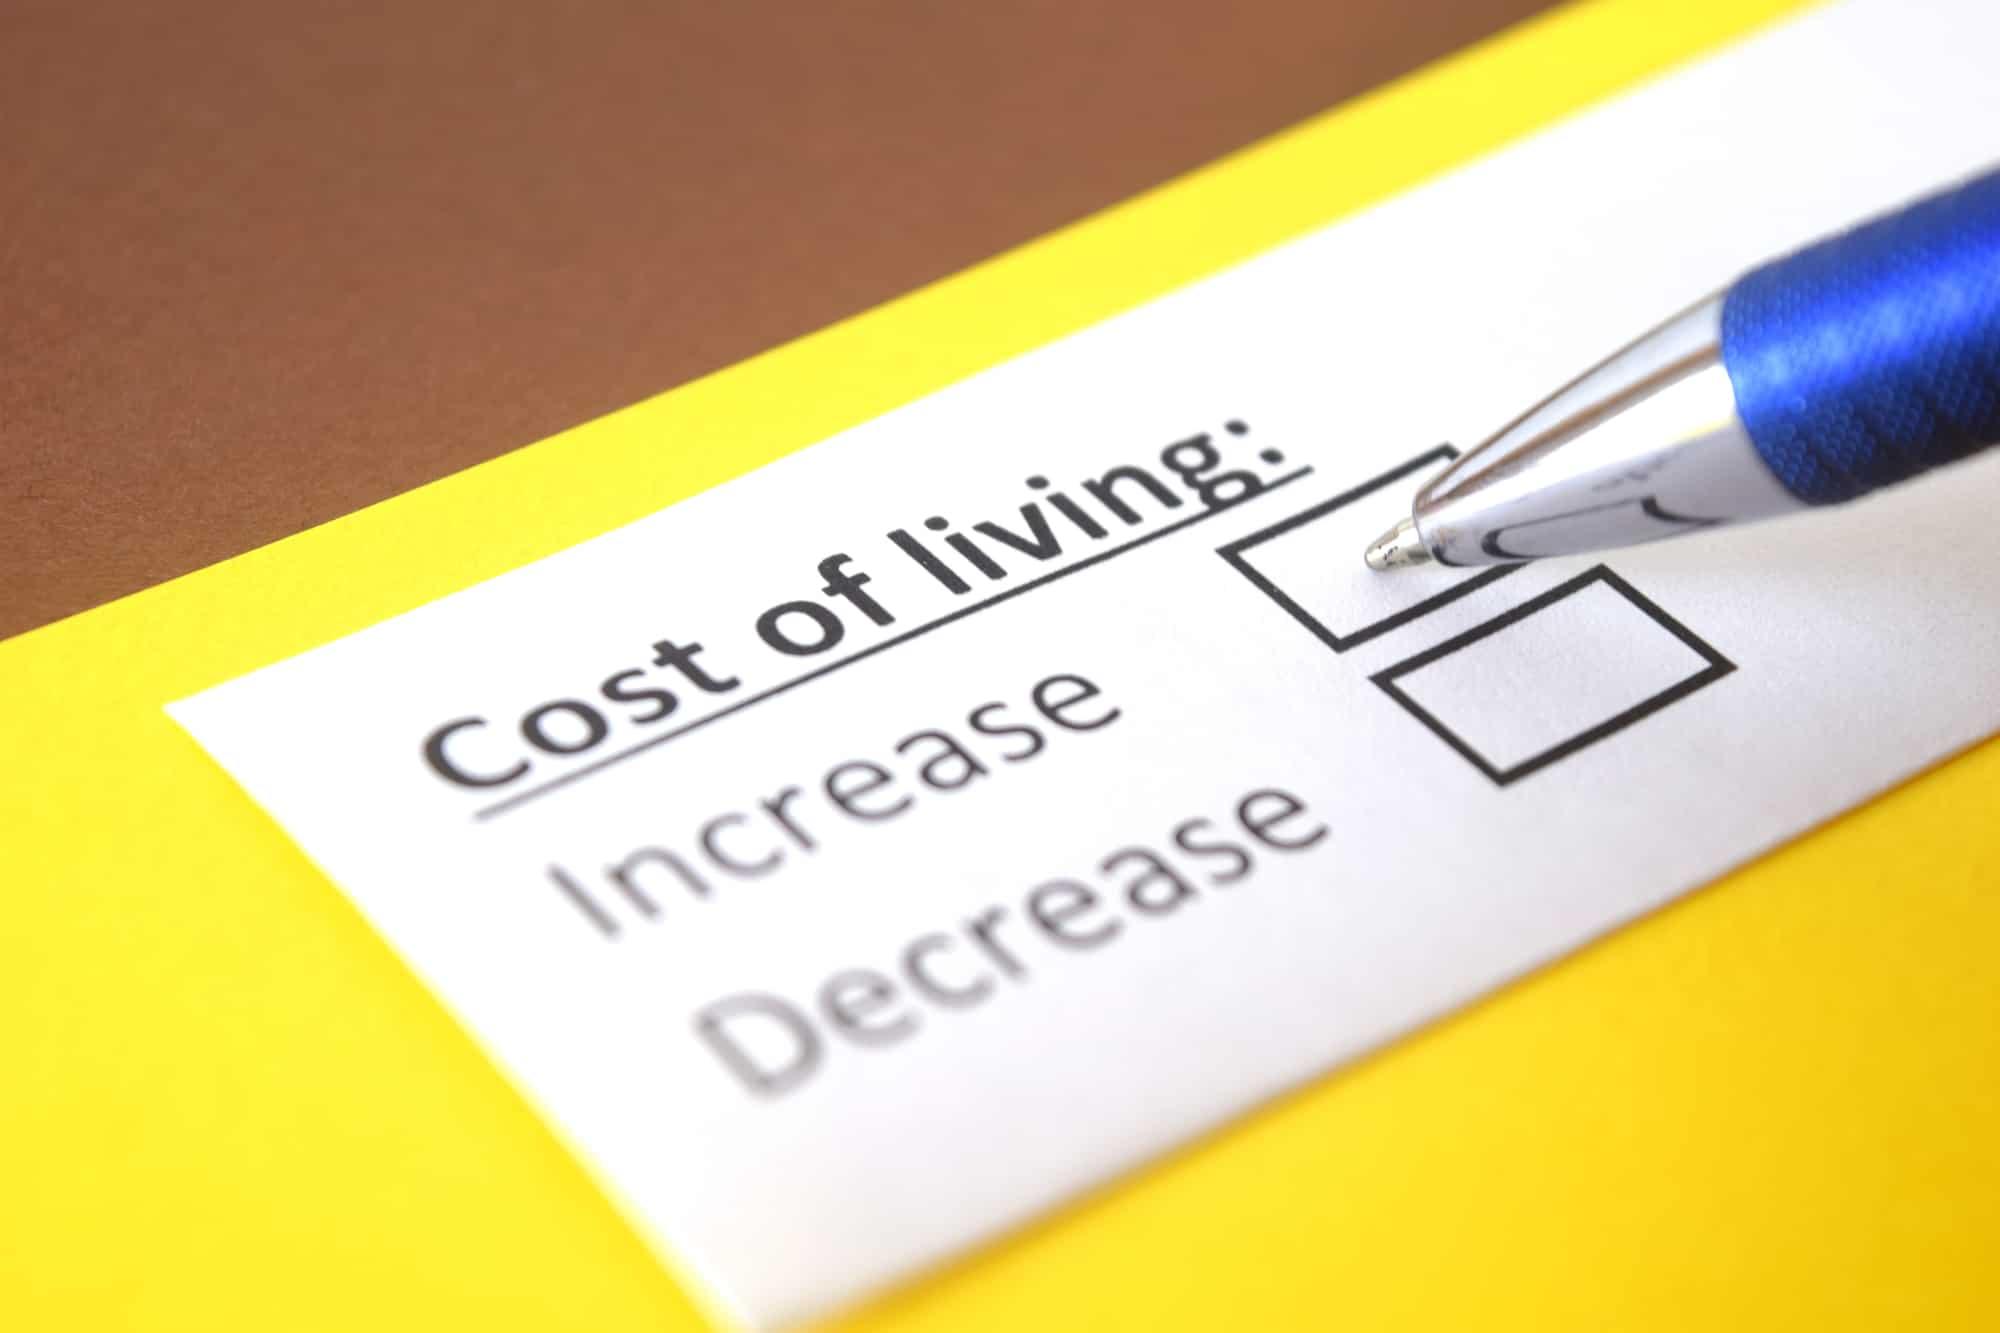 Cost of living adjustment (COLA) prediction